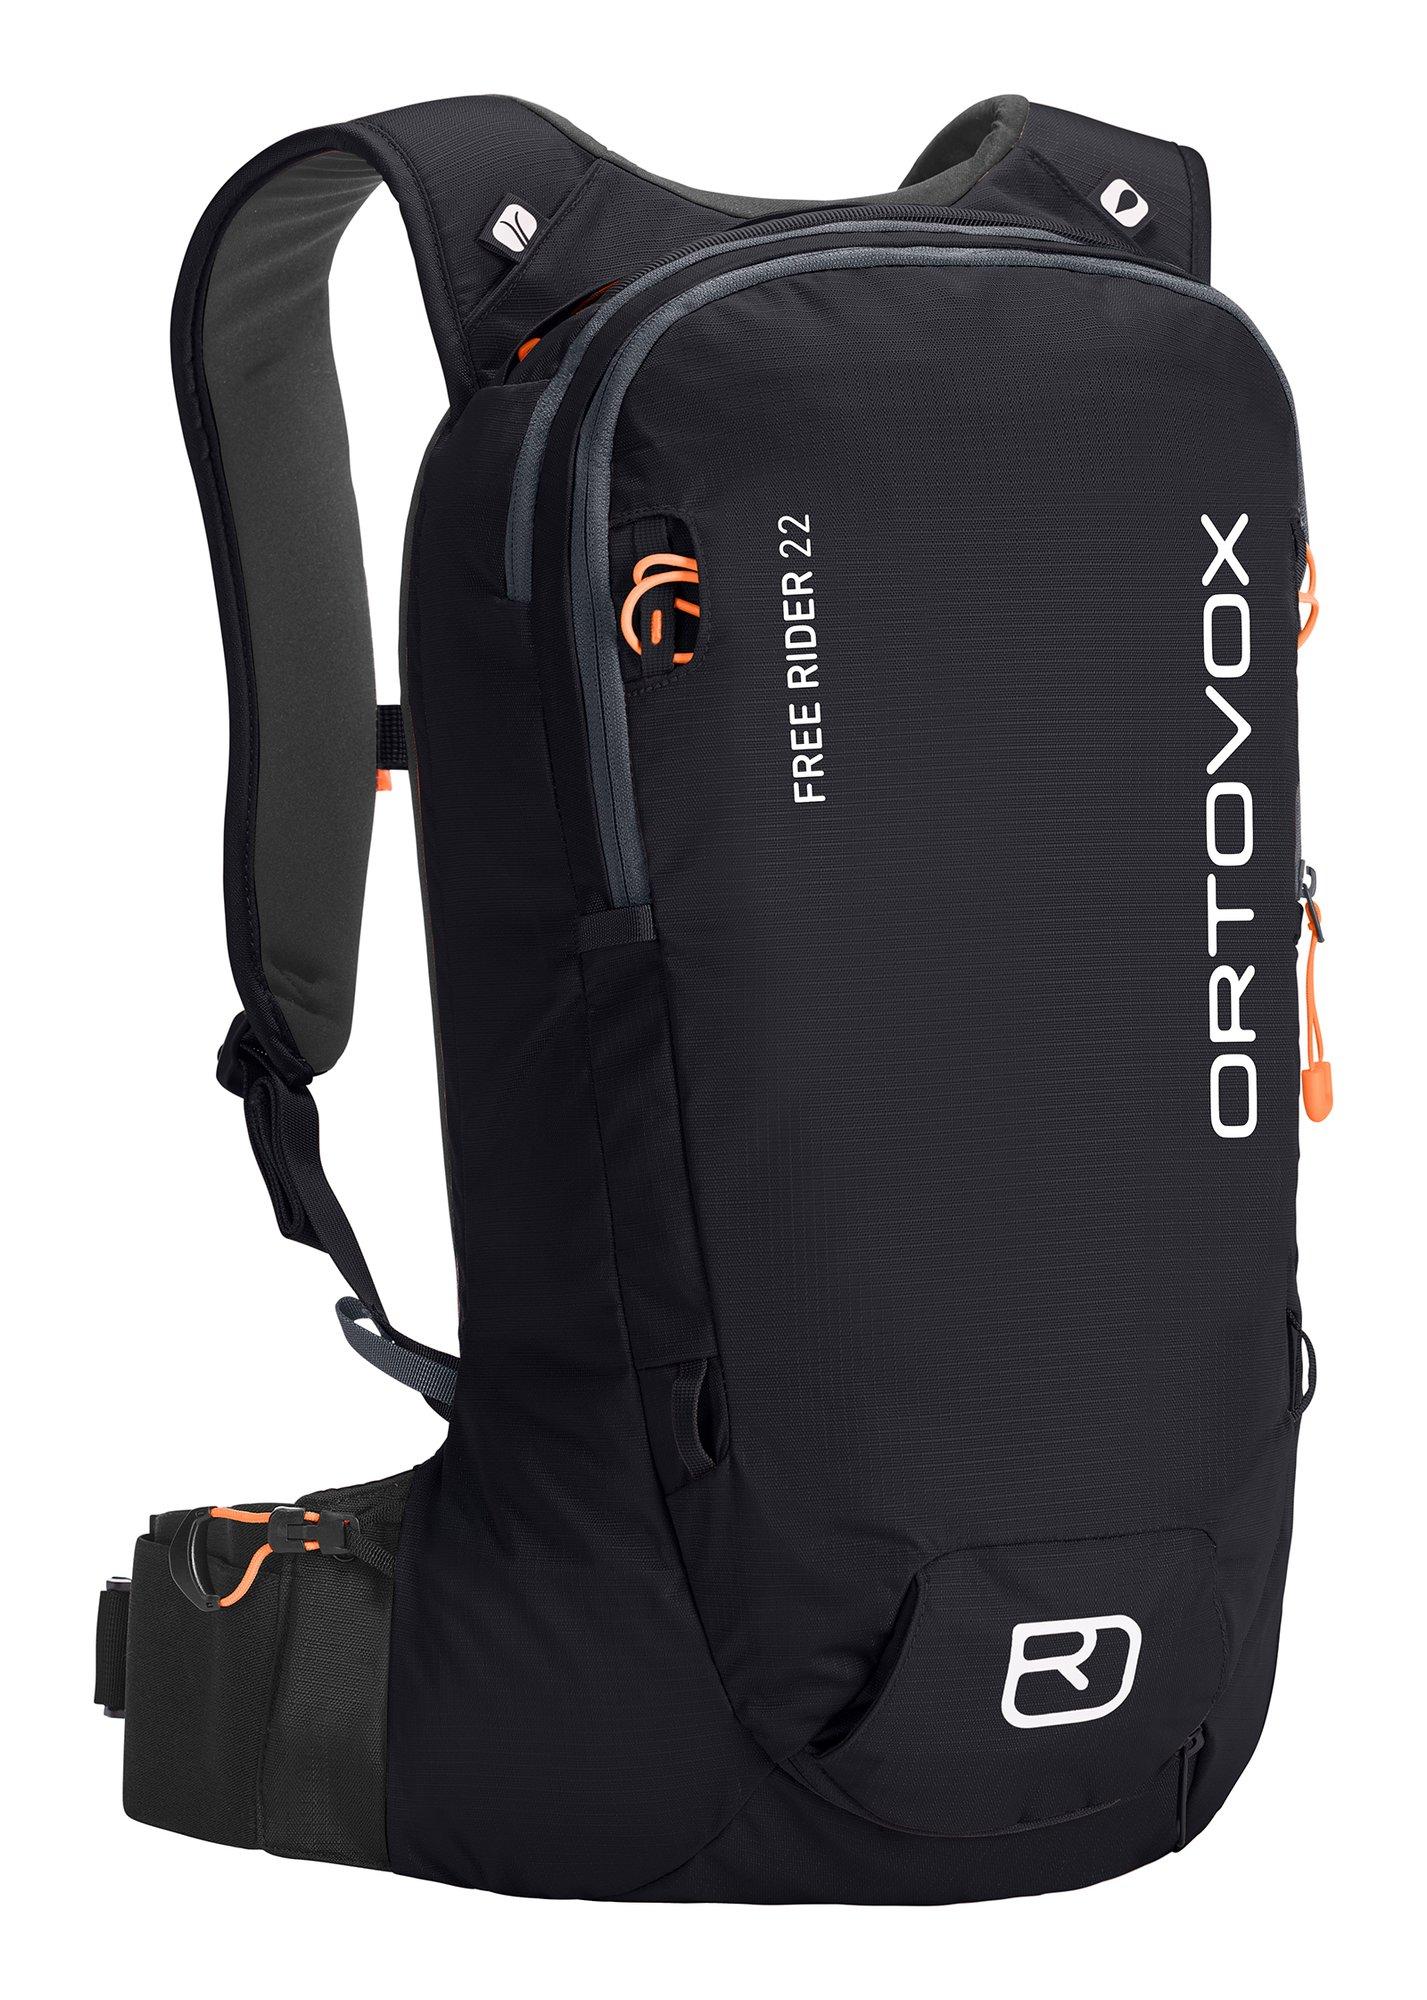 Ortovox - Free Rider 22, Freeride-Rucksack